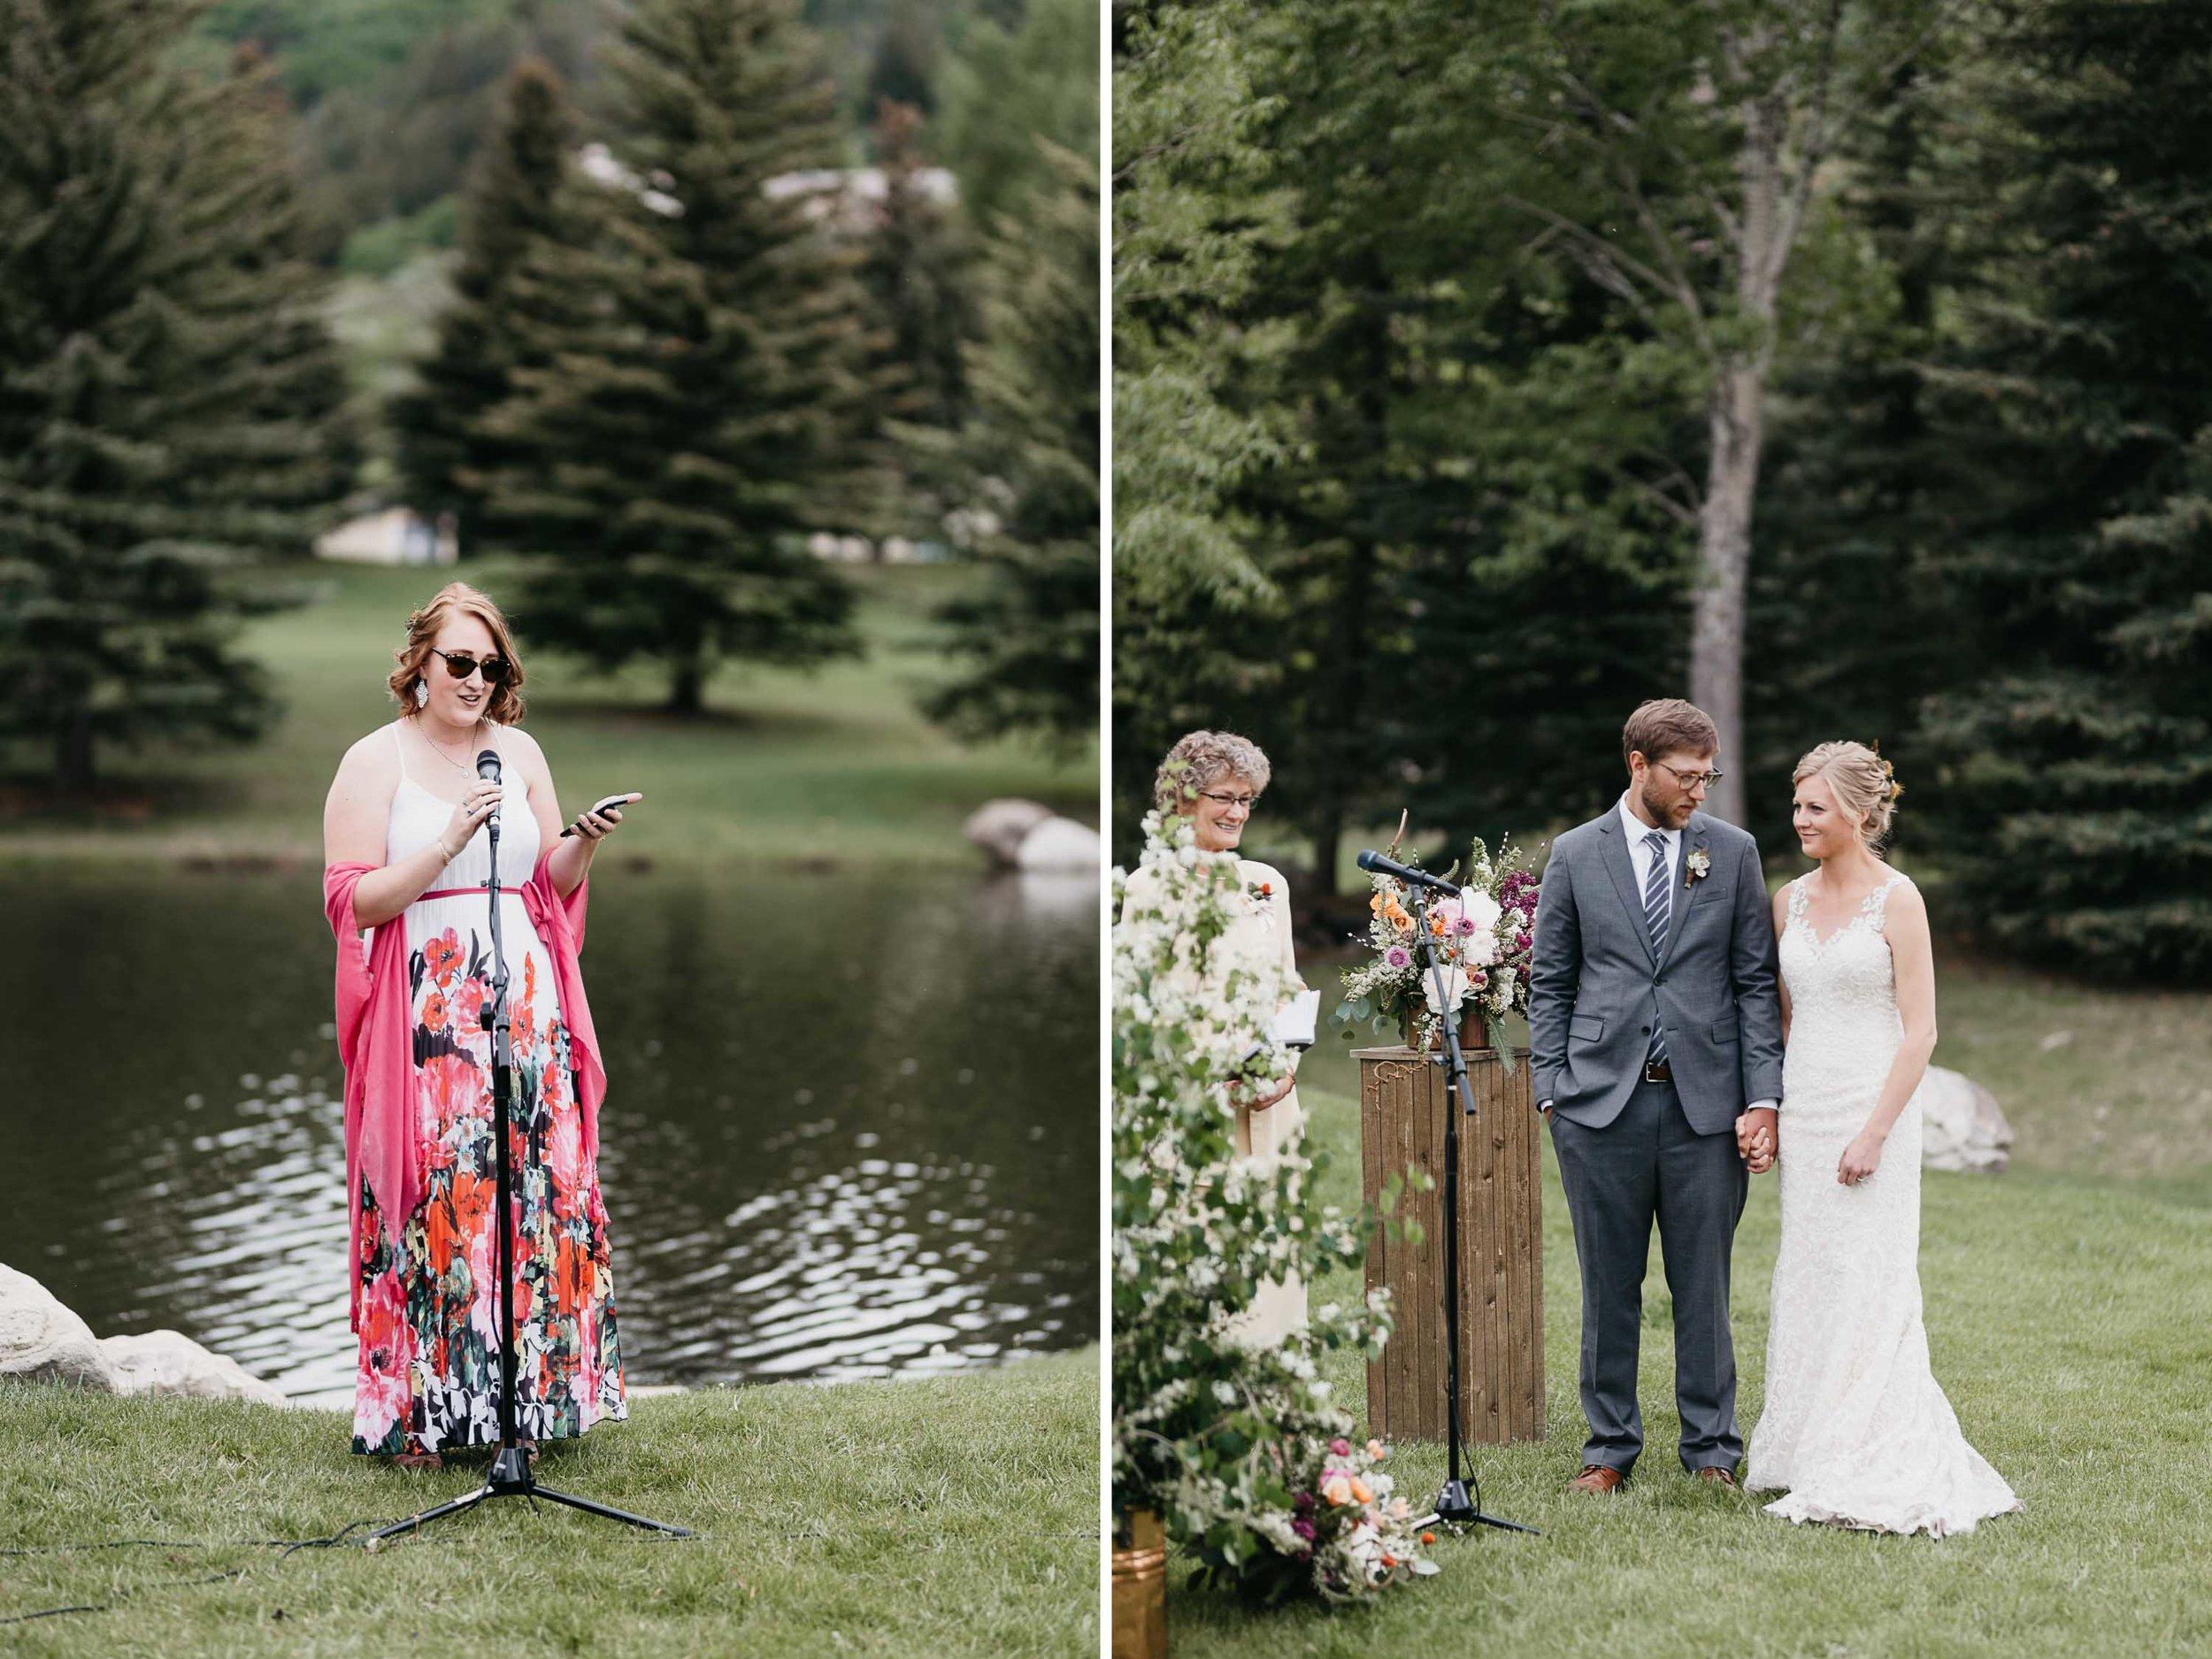 Colorado-Wedding-Photographer-58.jpg